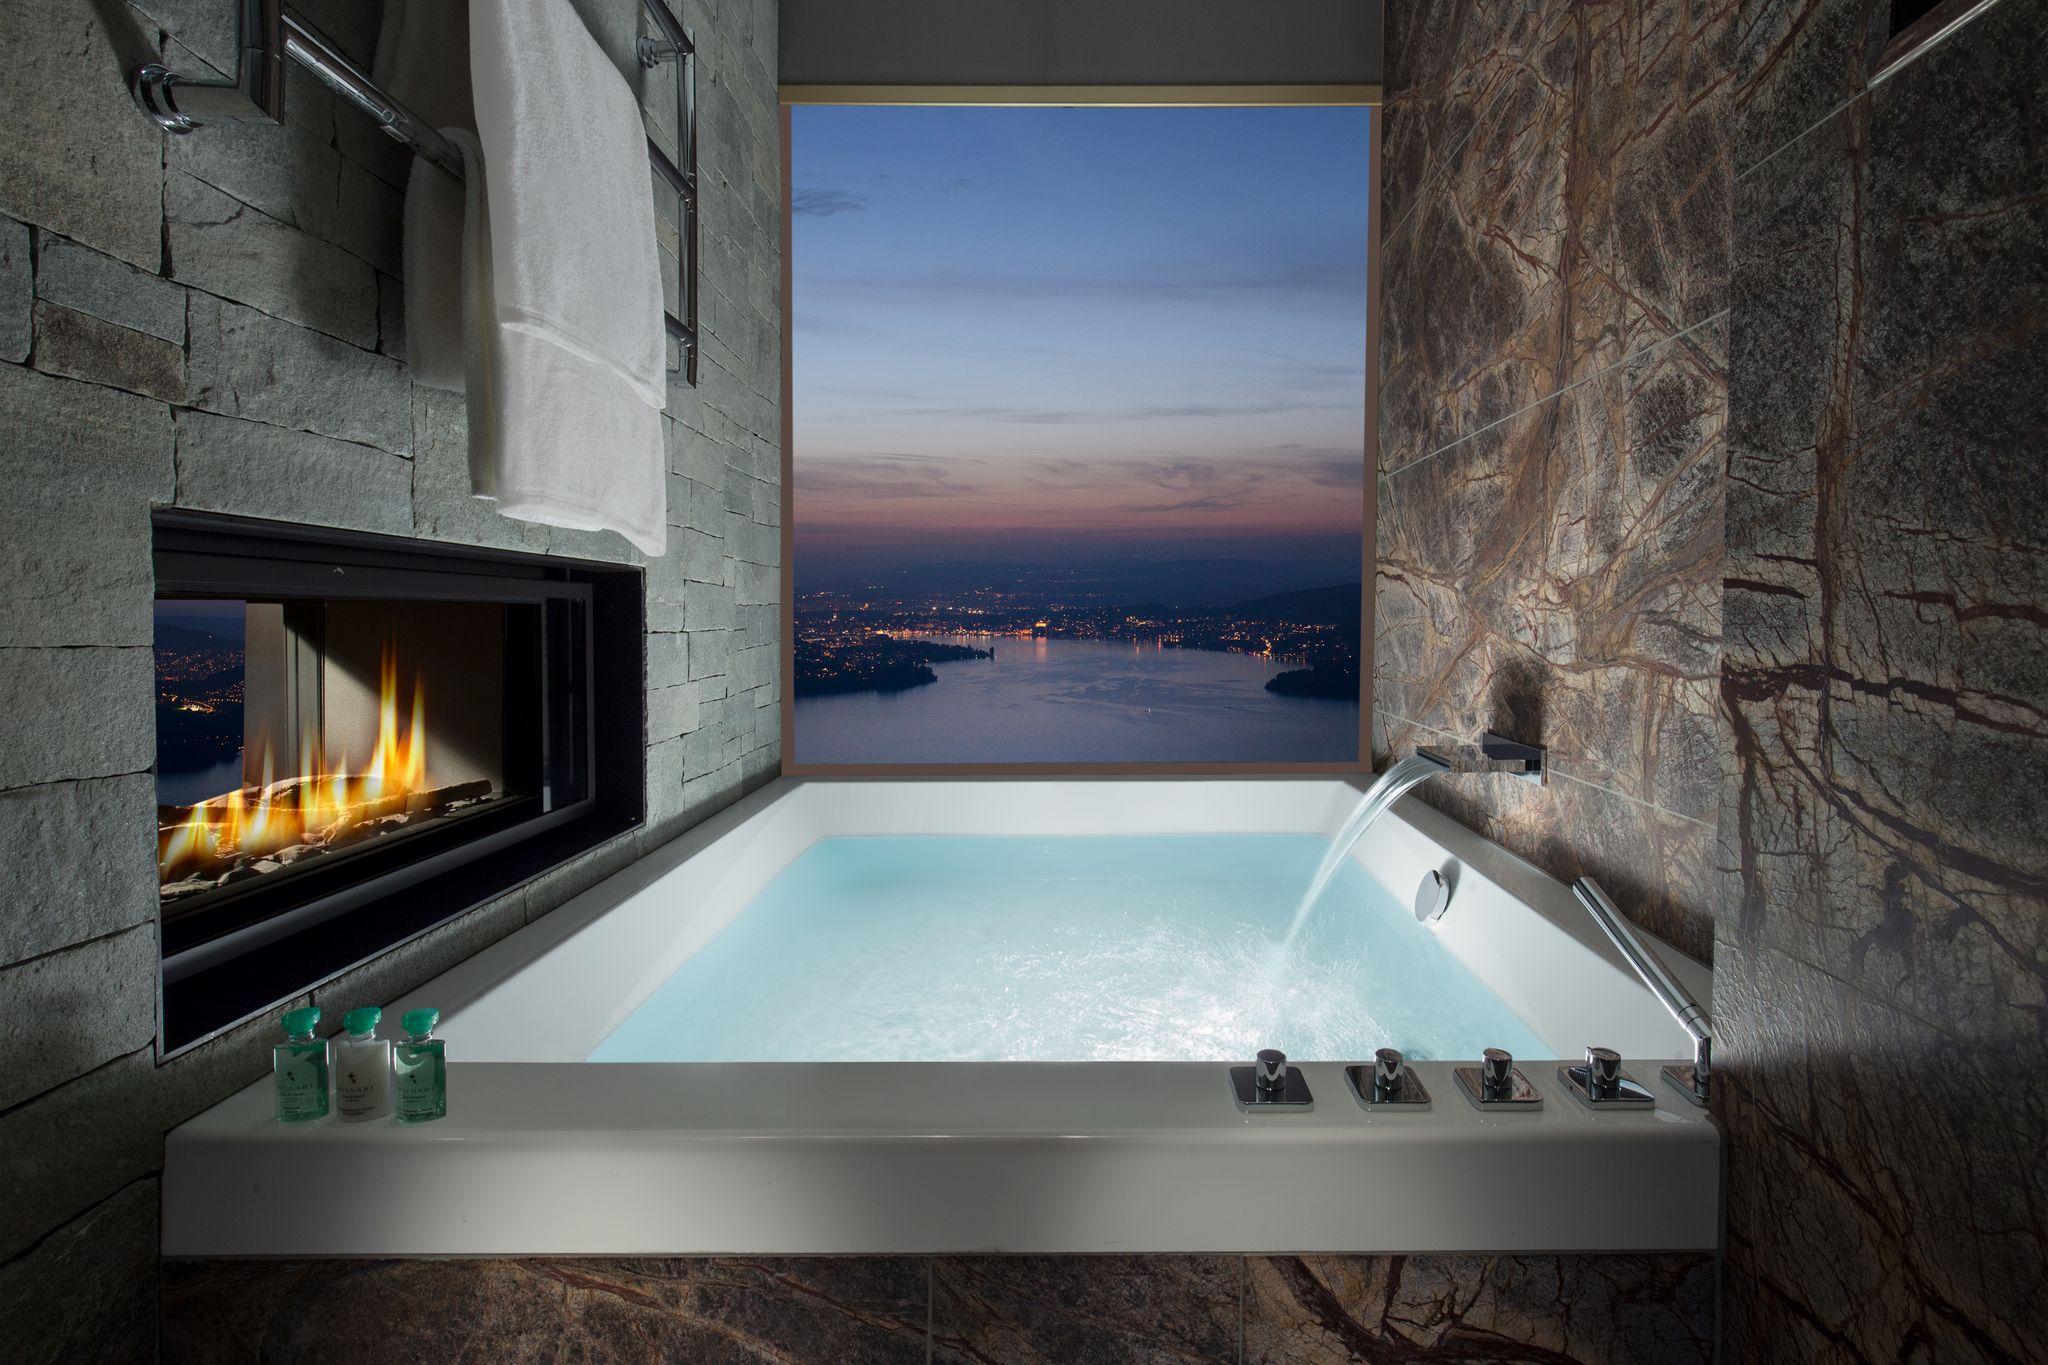 Swiss Spa Pool